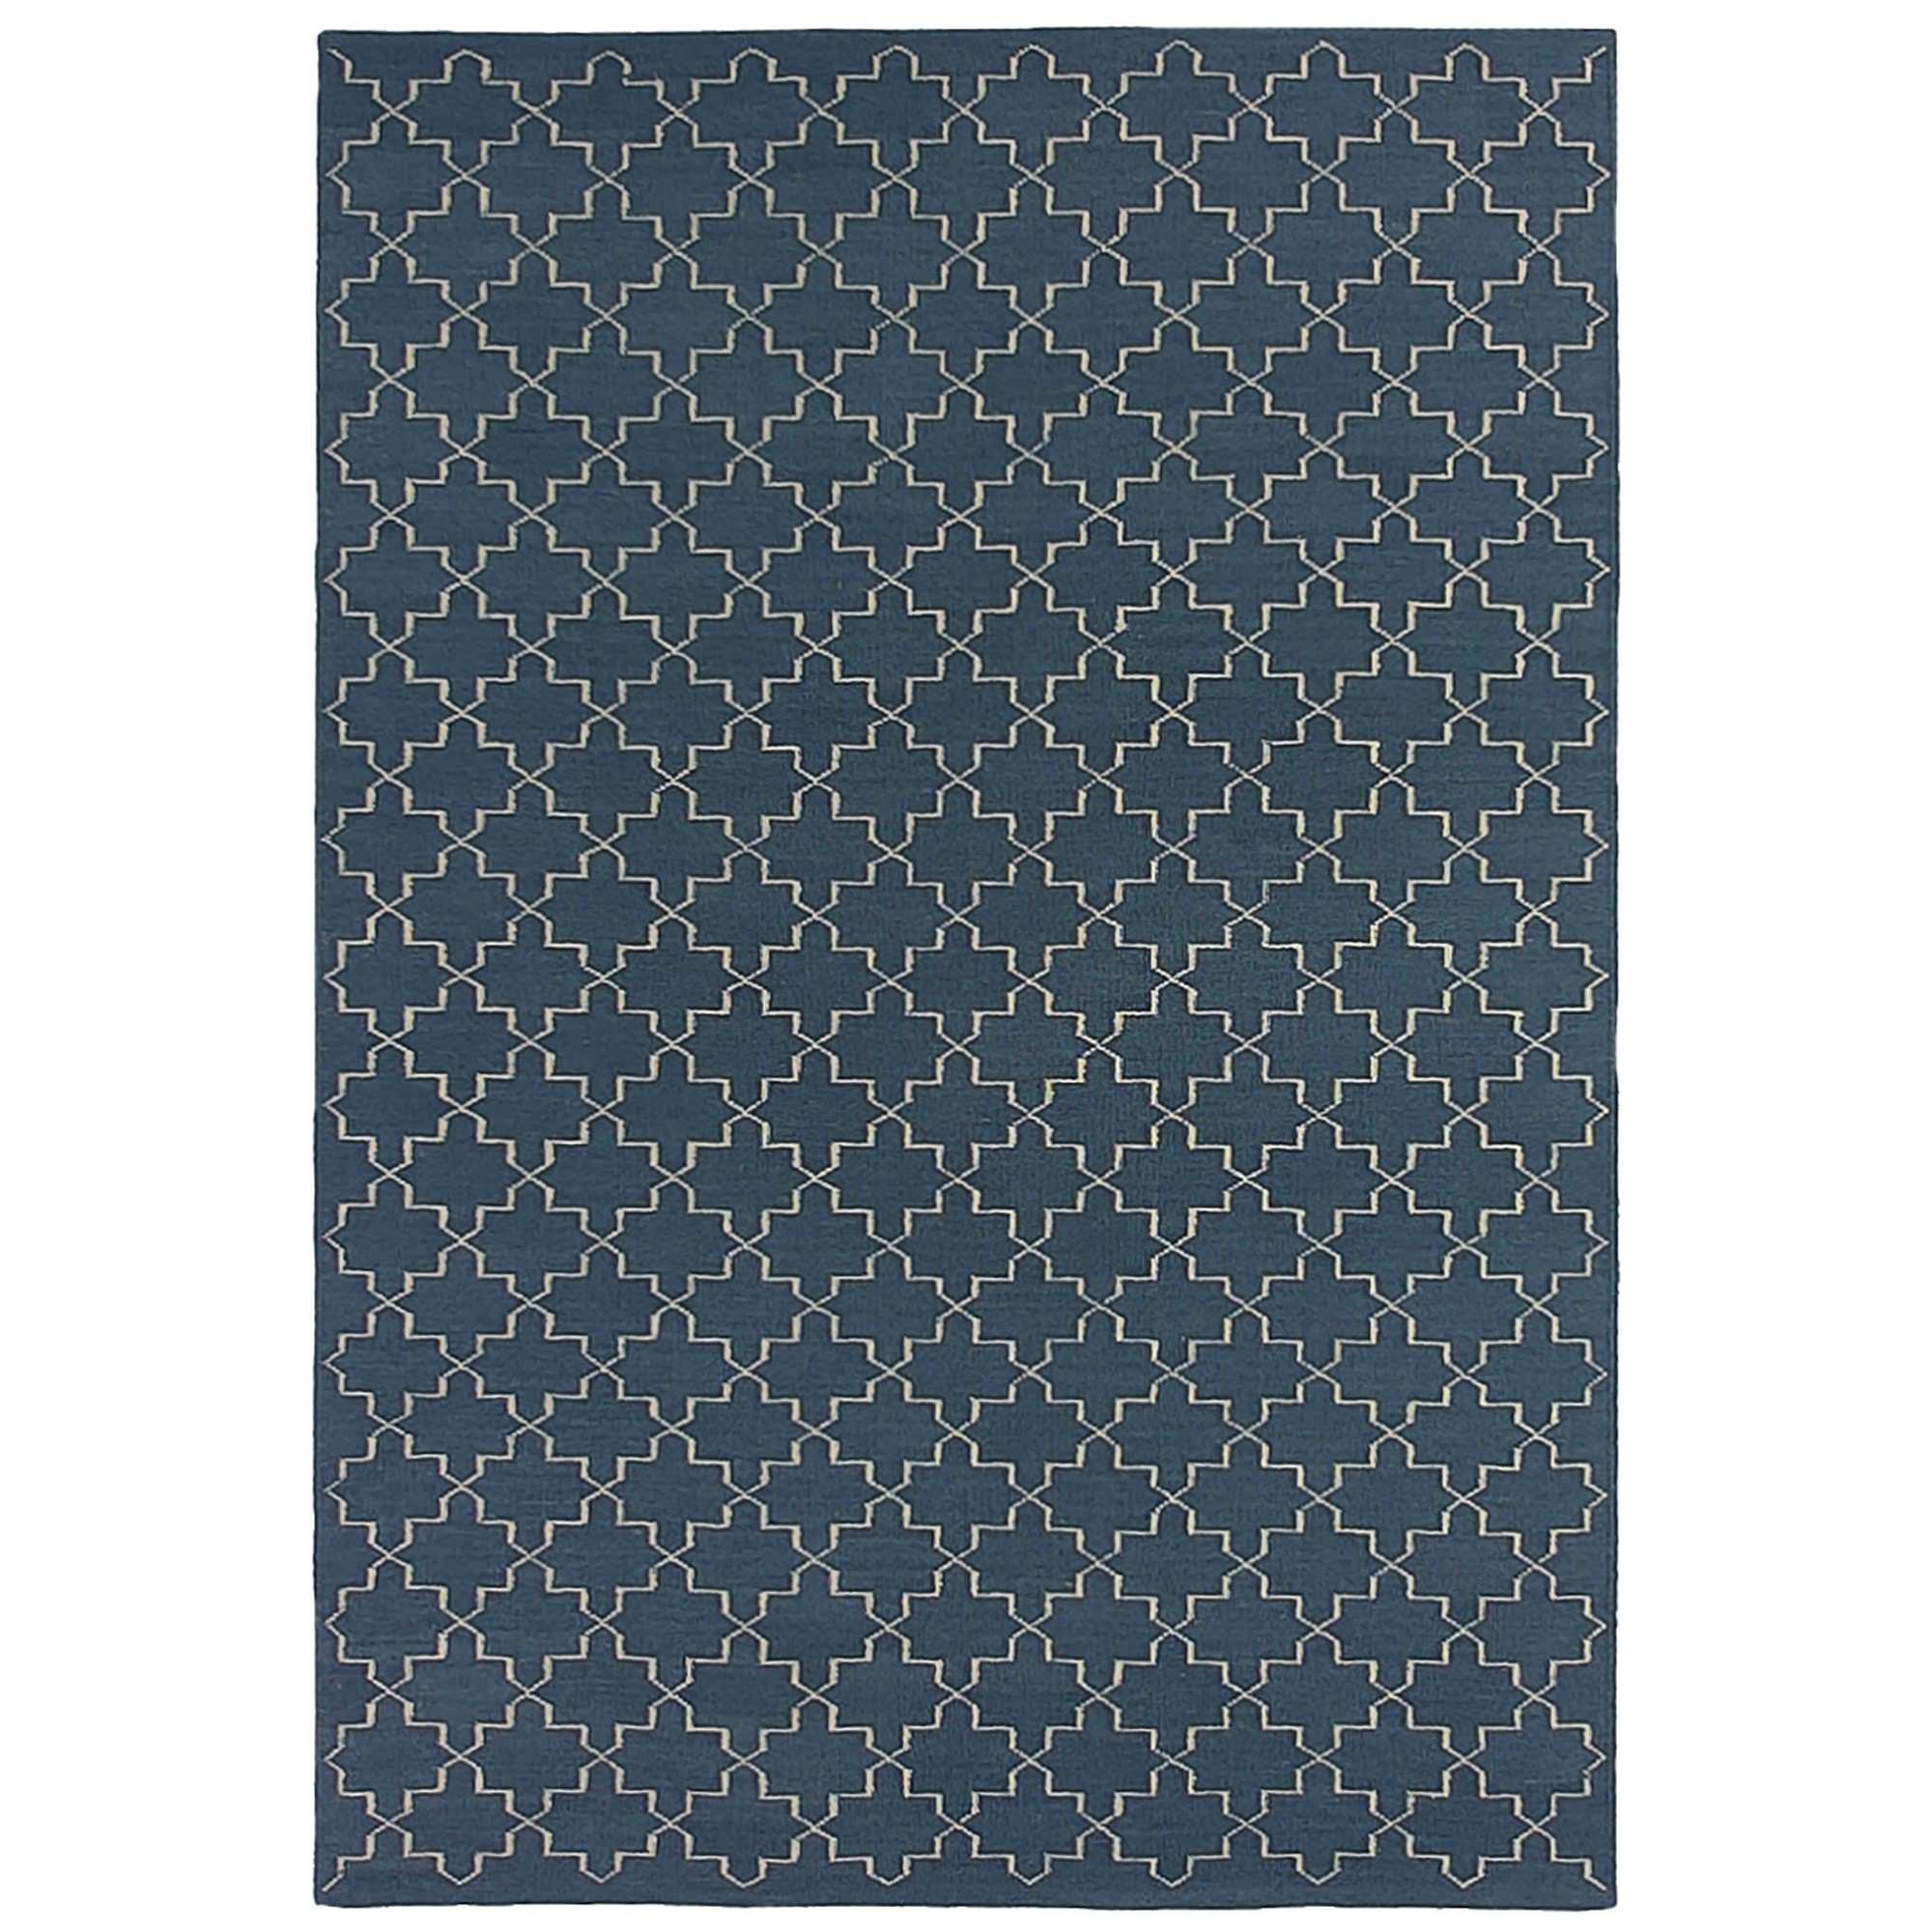 Moroc Hand Woven Wool Rug, 300x400cm, Navy